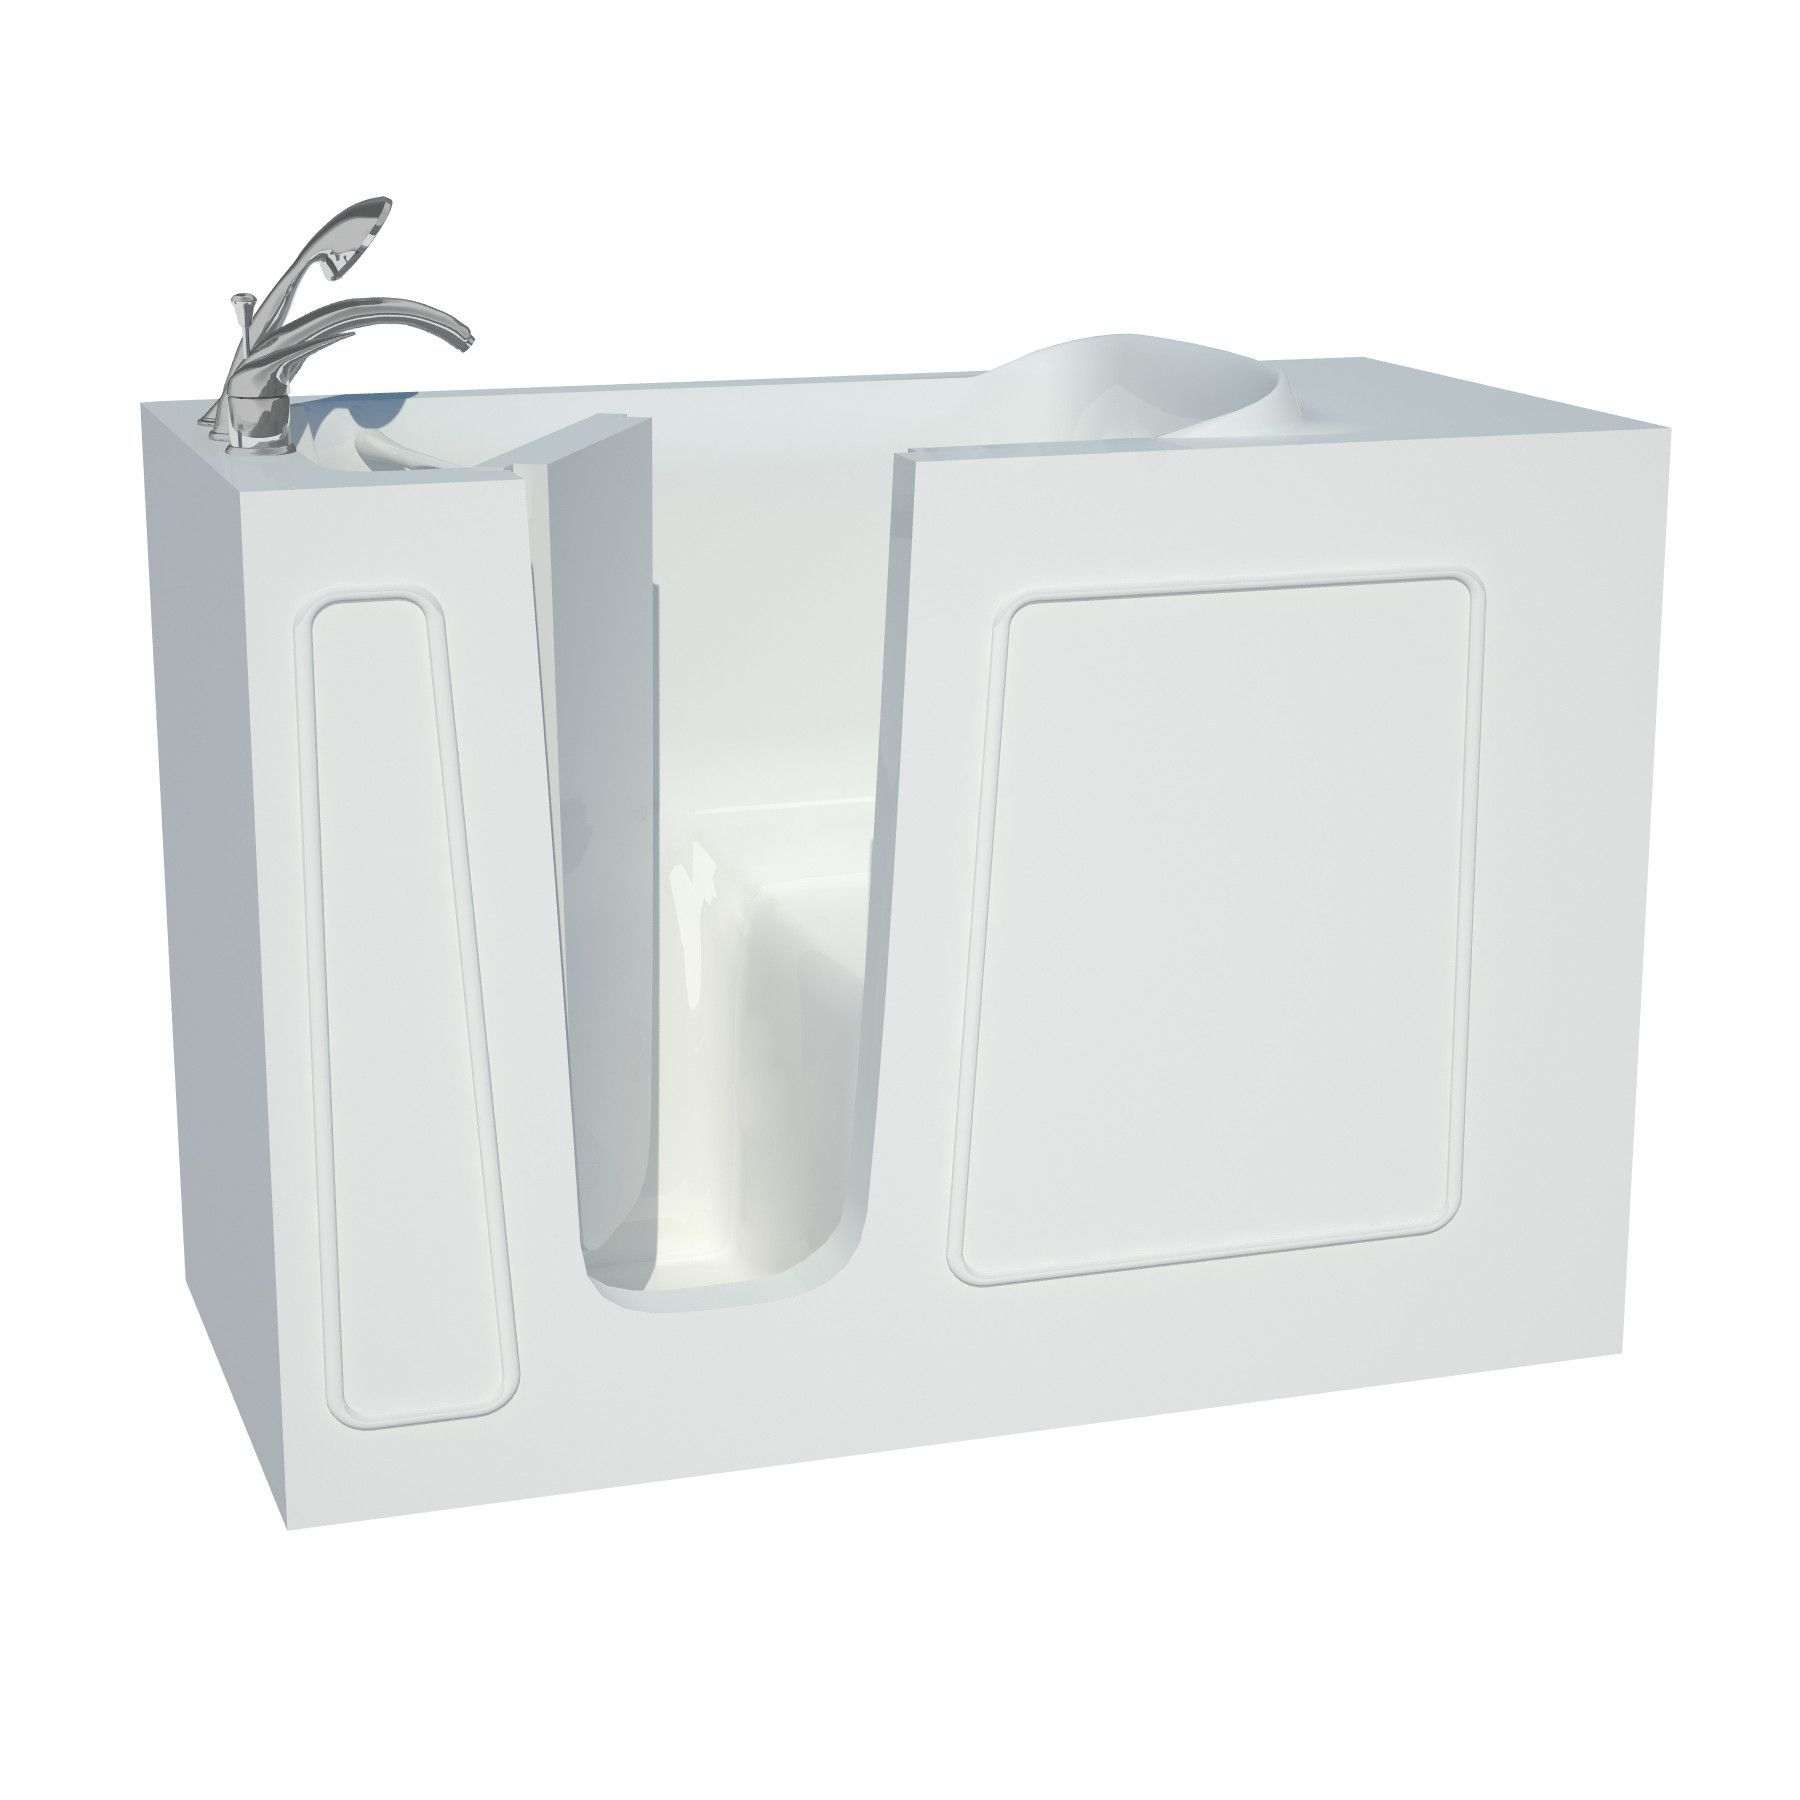 Venzi Vzb2653lws Artisan Series 26x53 White Soaker Walk In Tub